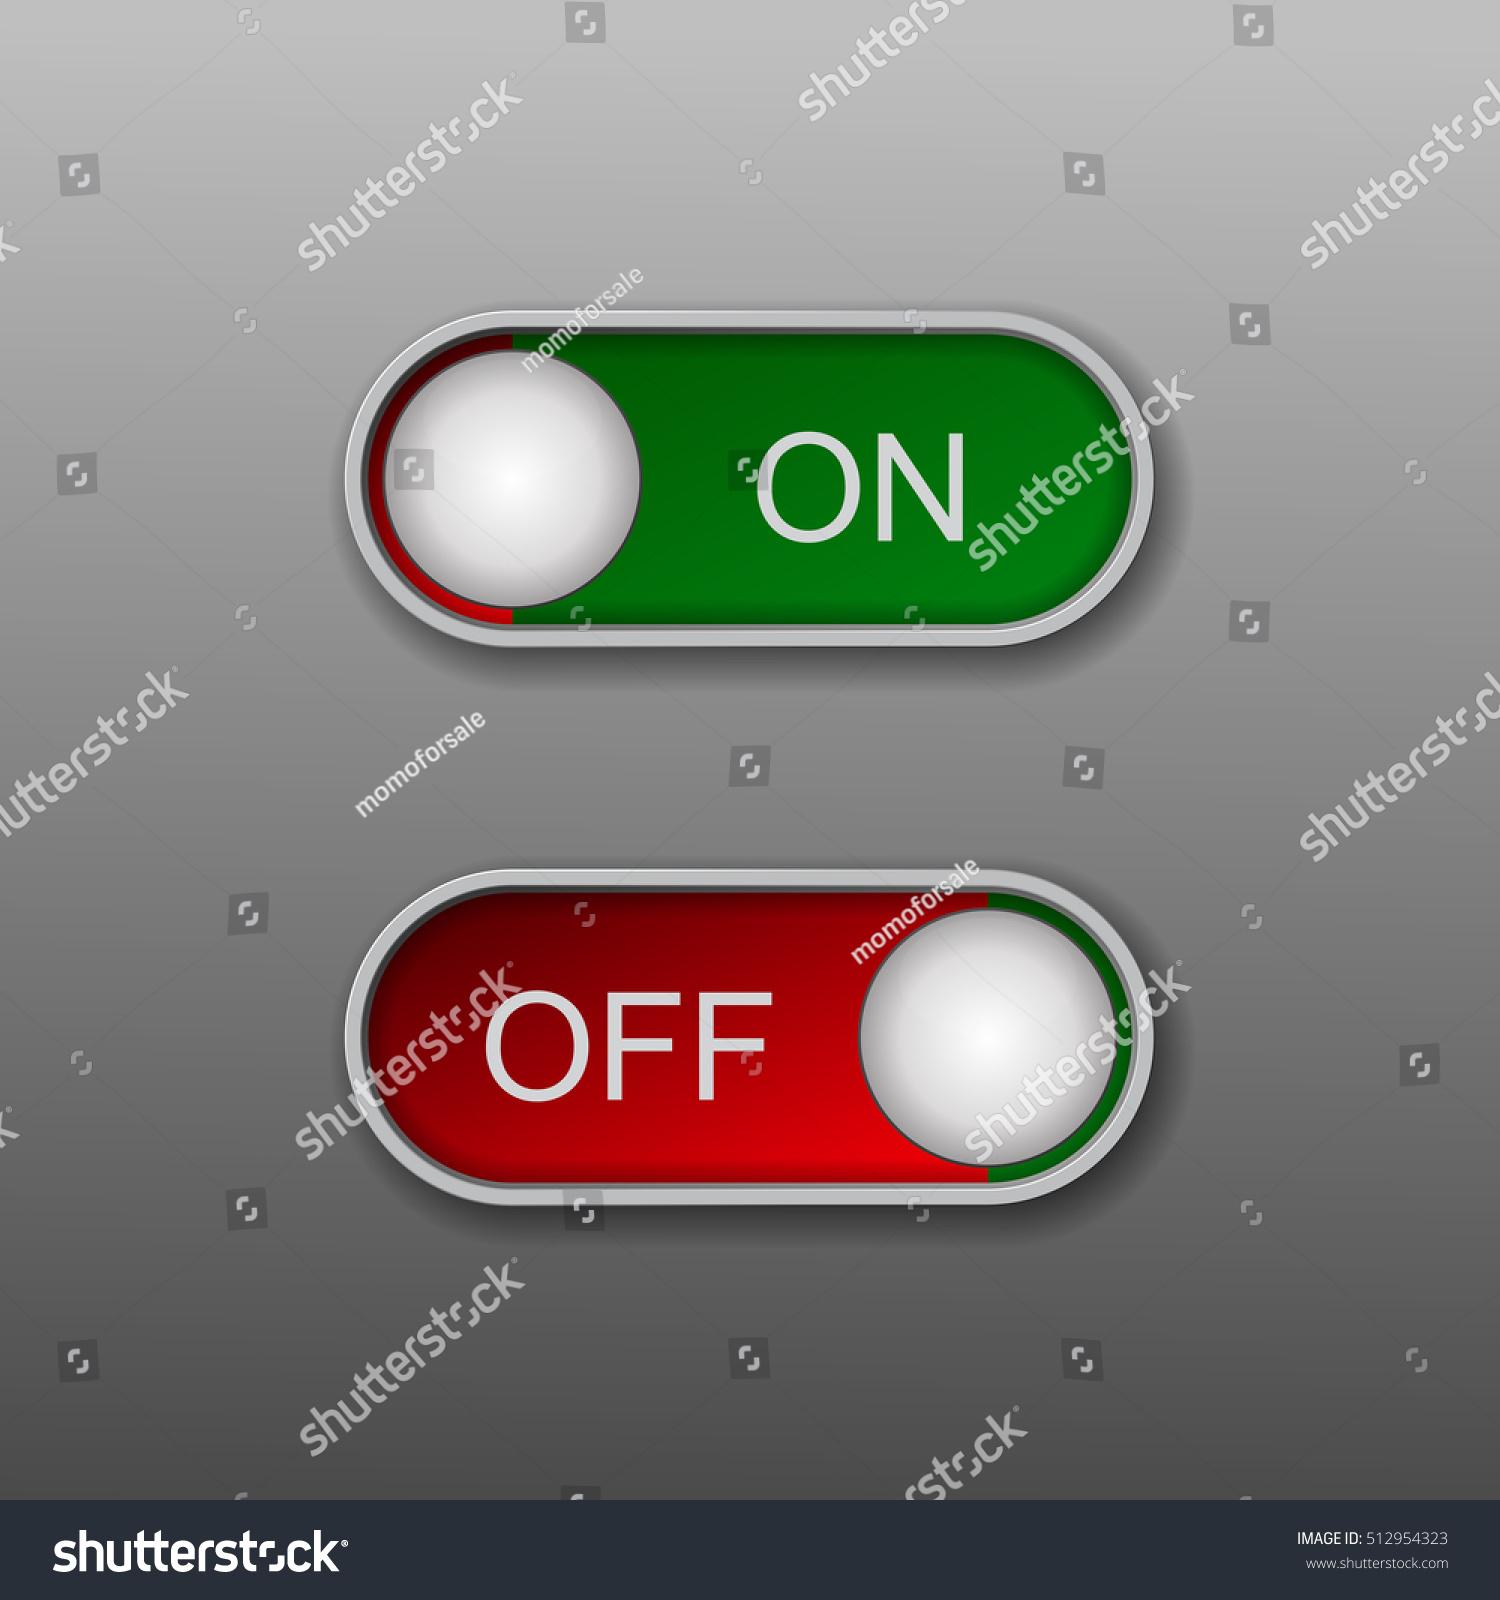 On Off Switch Symbol Autocad